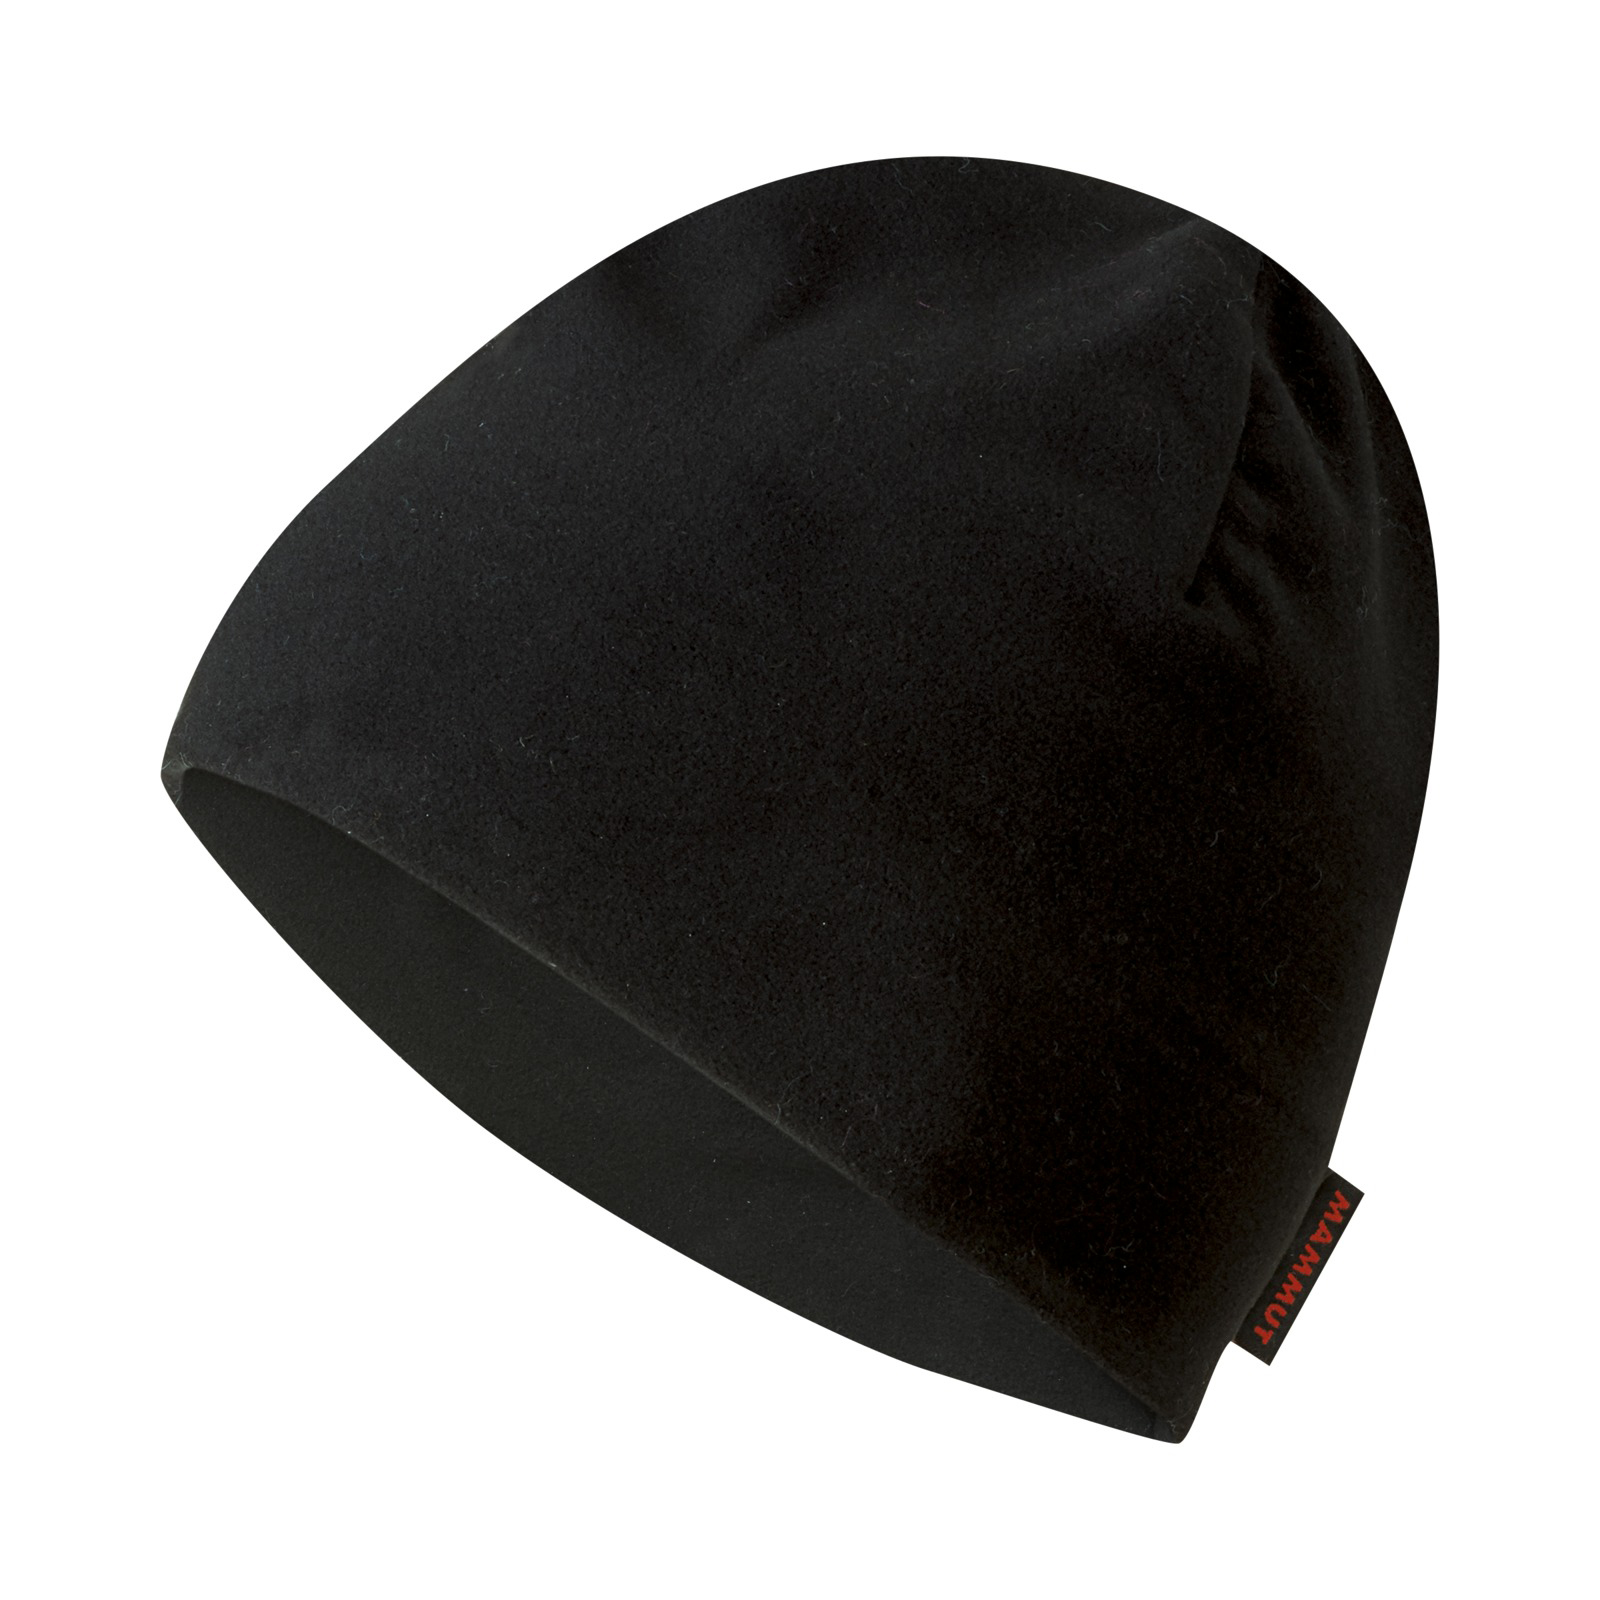 Herren Mütze Fleece Beanie